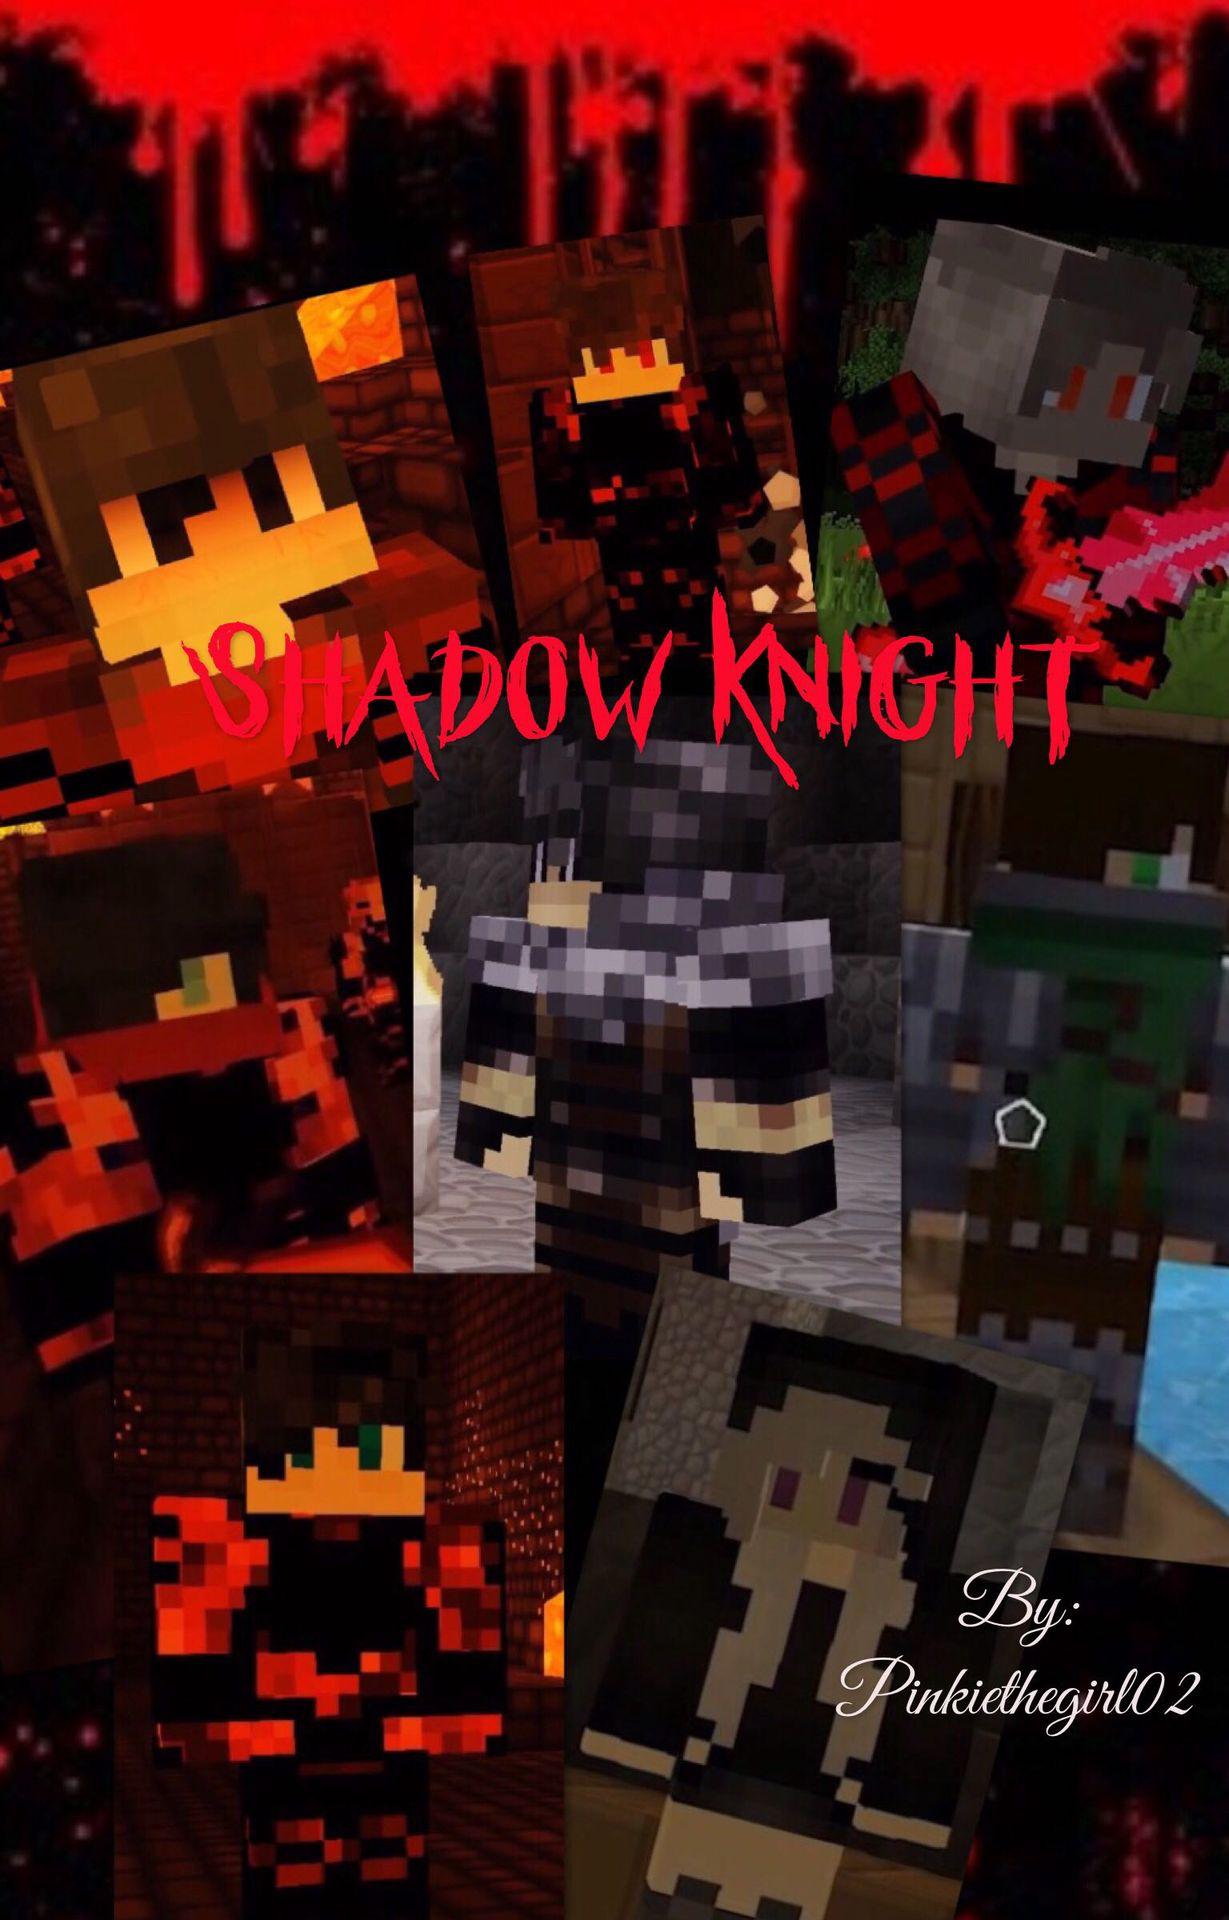 shadow knights-aphmau fanfic - prologue